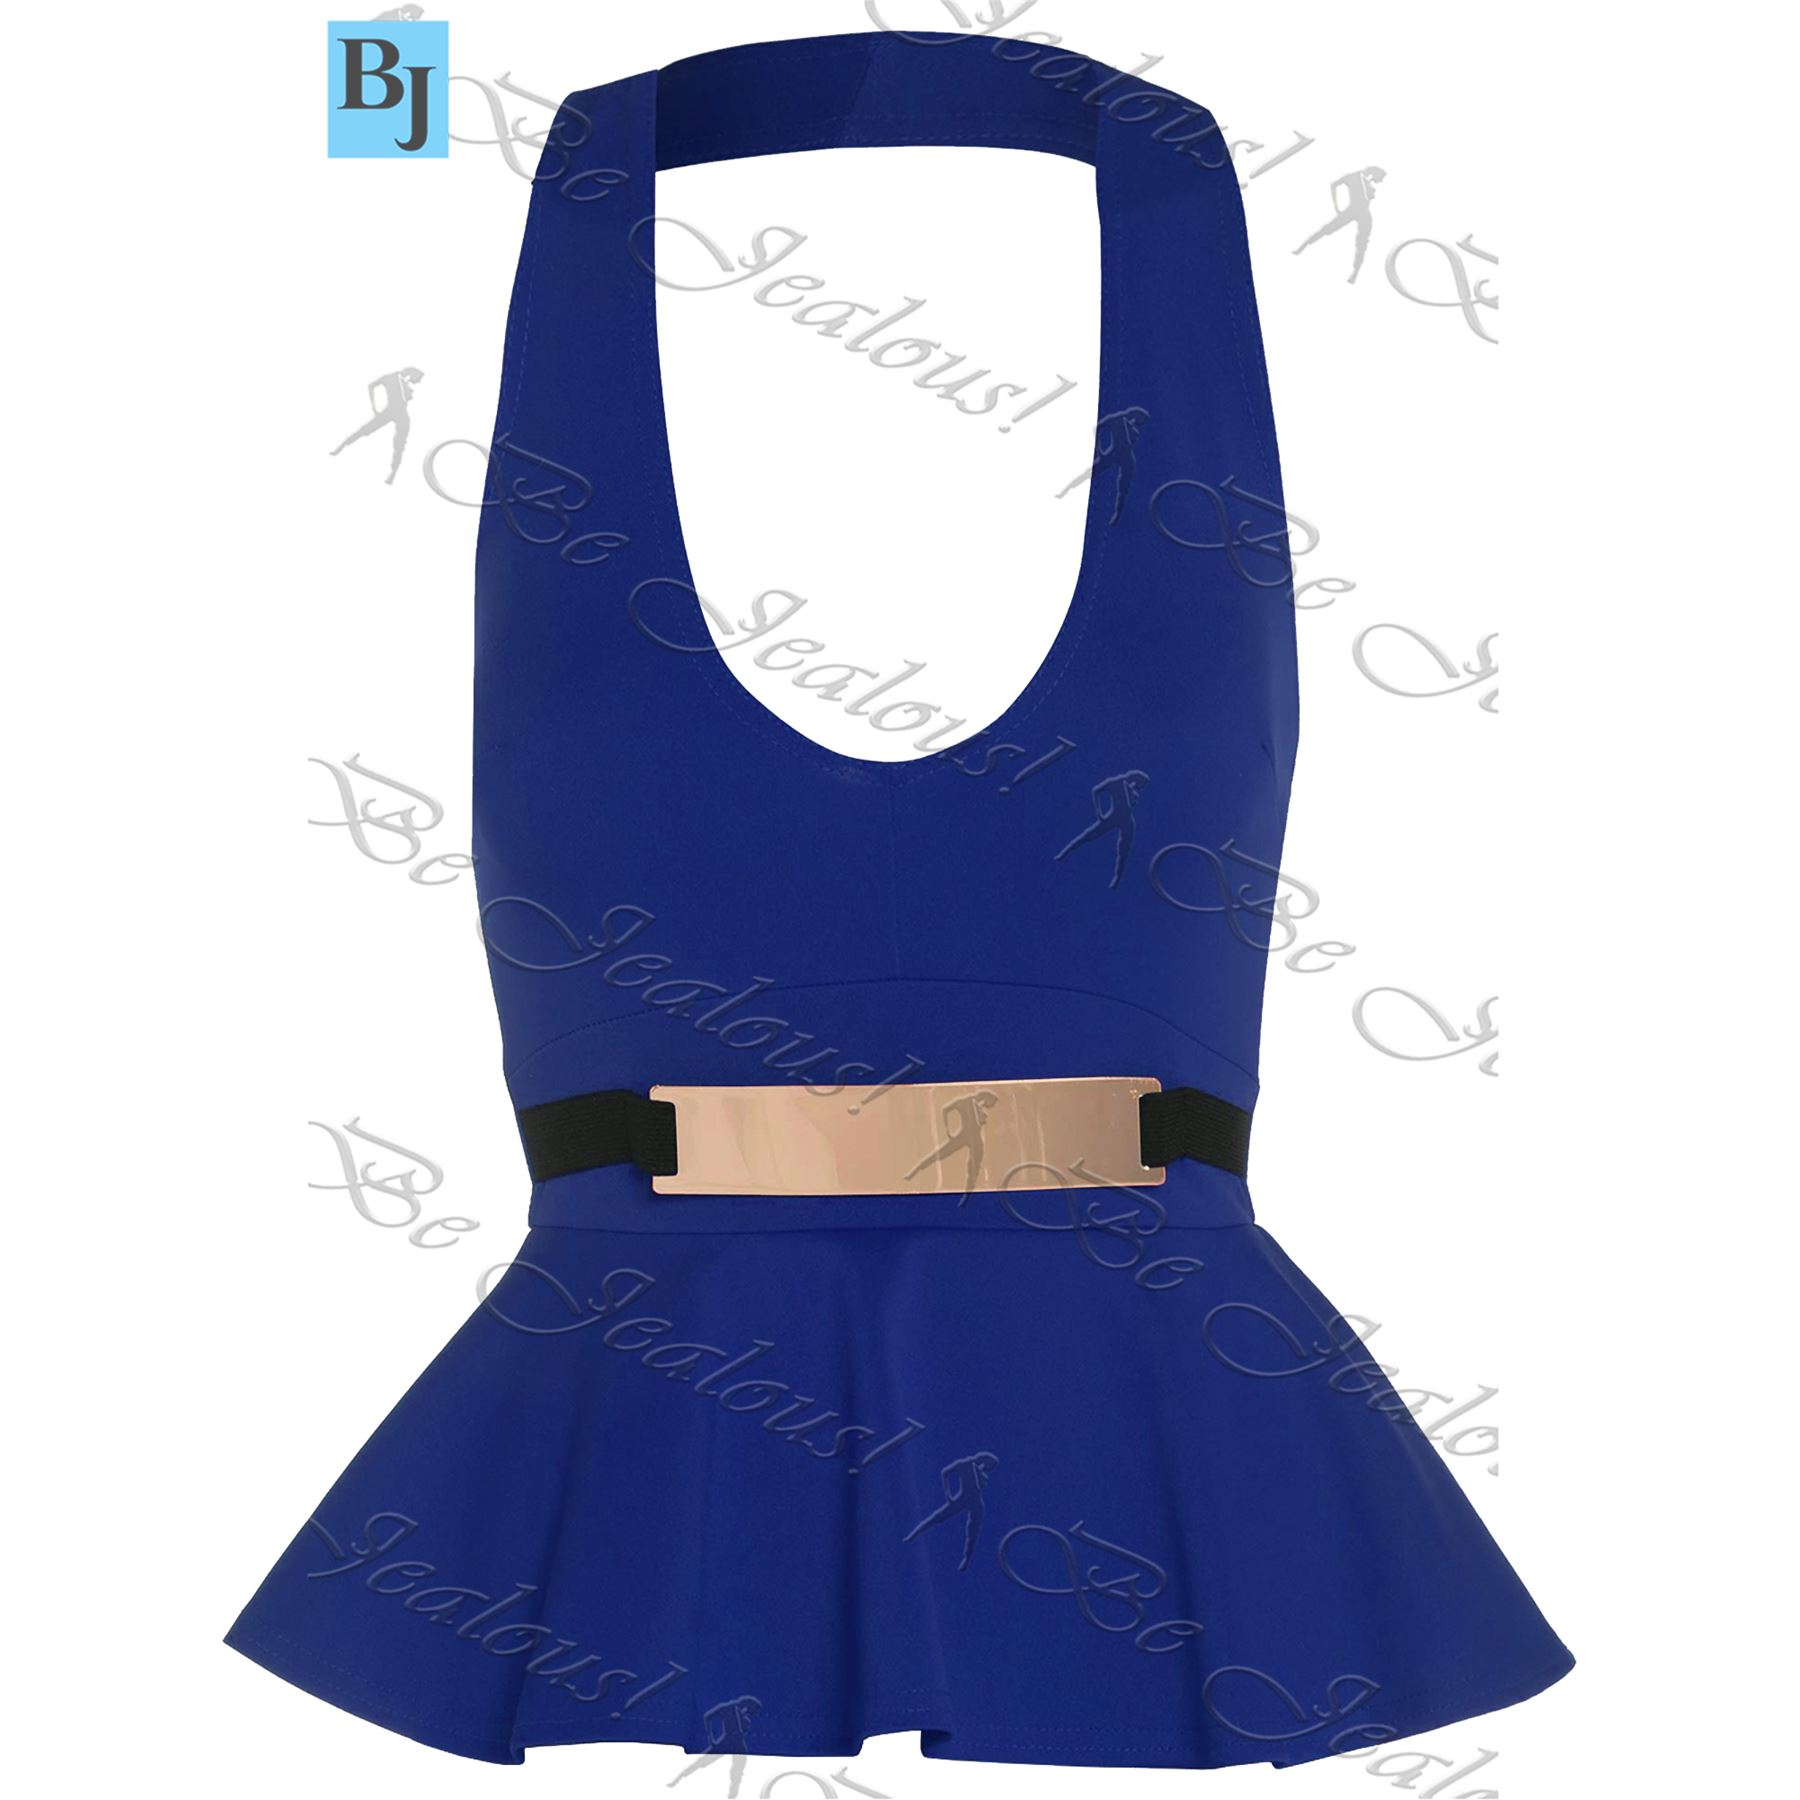 Womens Mini Dress Ladies Peplum Frill Bodycon Belted Sleeveless Halter Neck Top